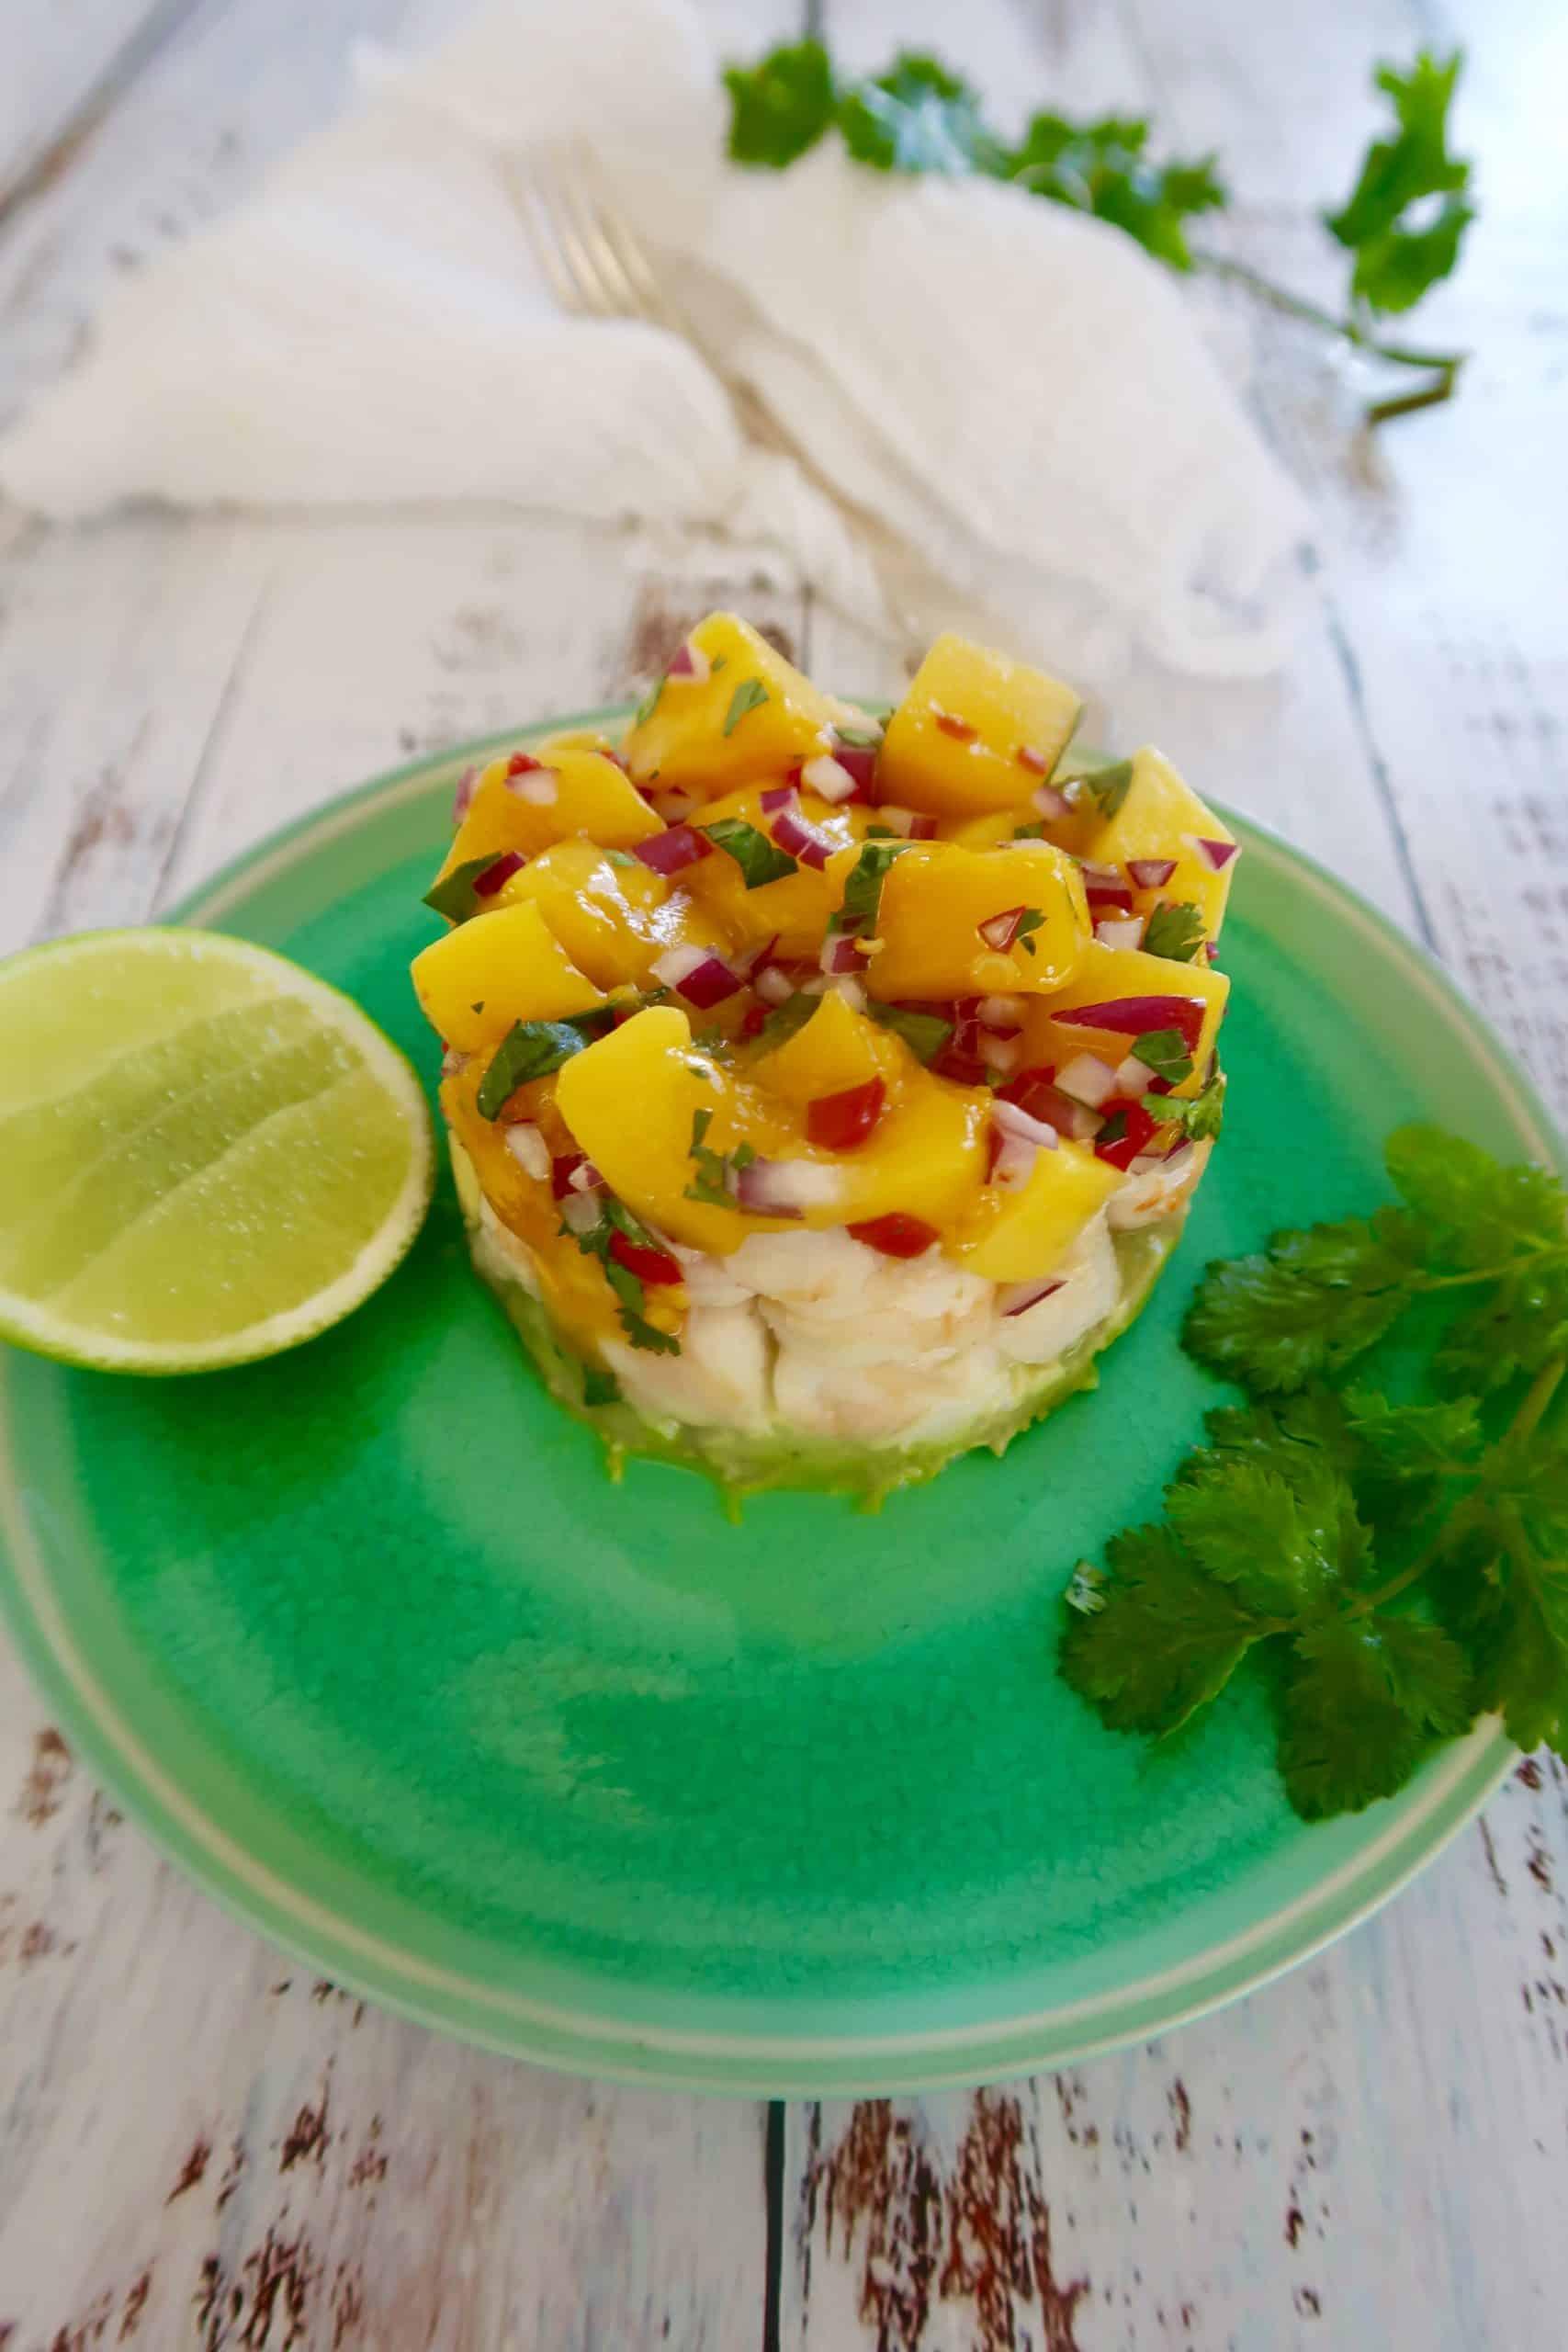 Mexican prawn, mango and avocado salad